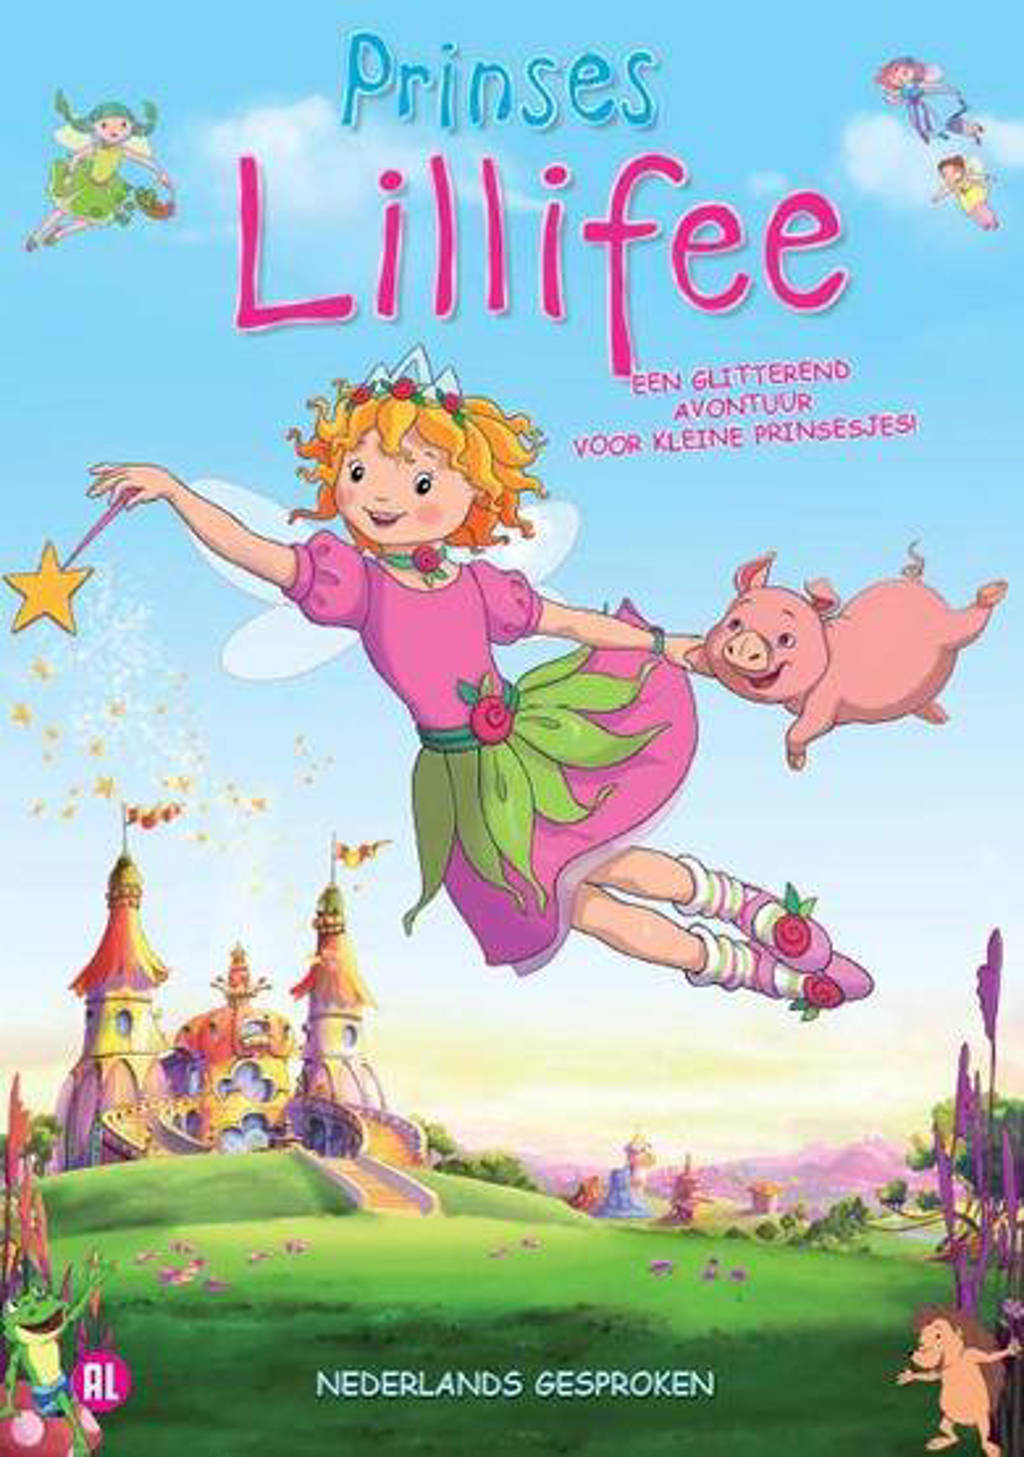 Prinses Lillifee (DVD)